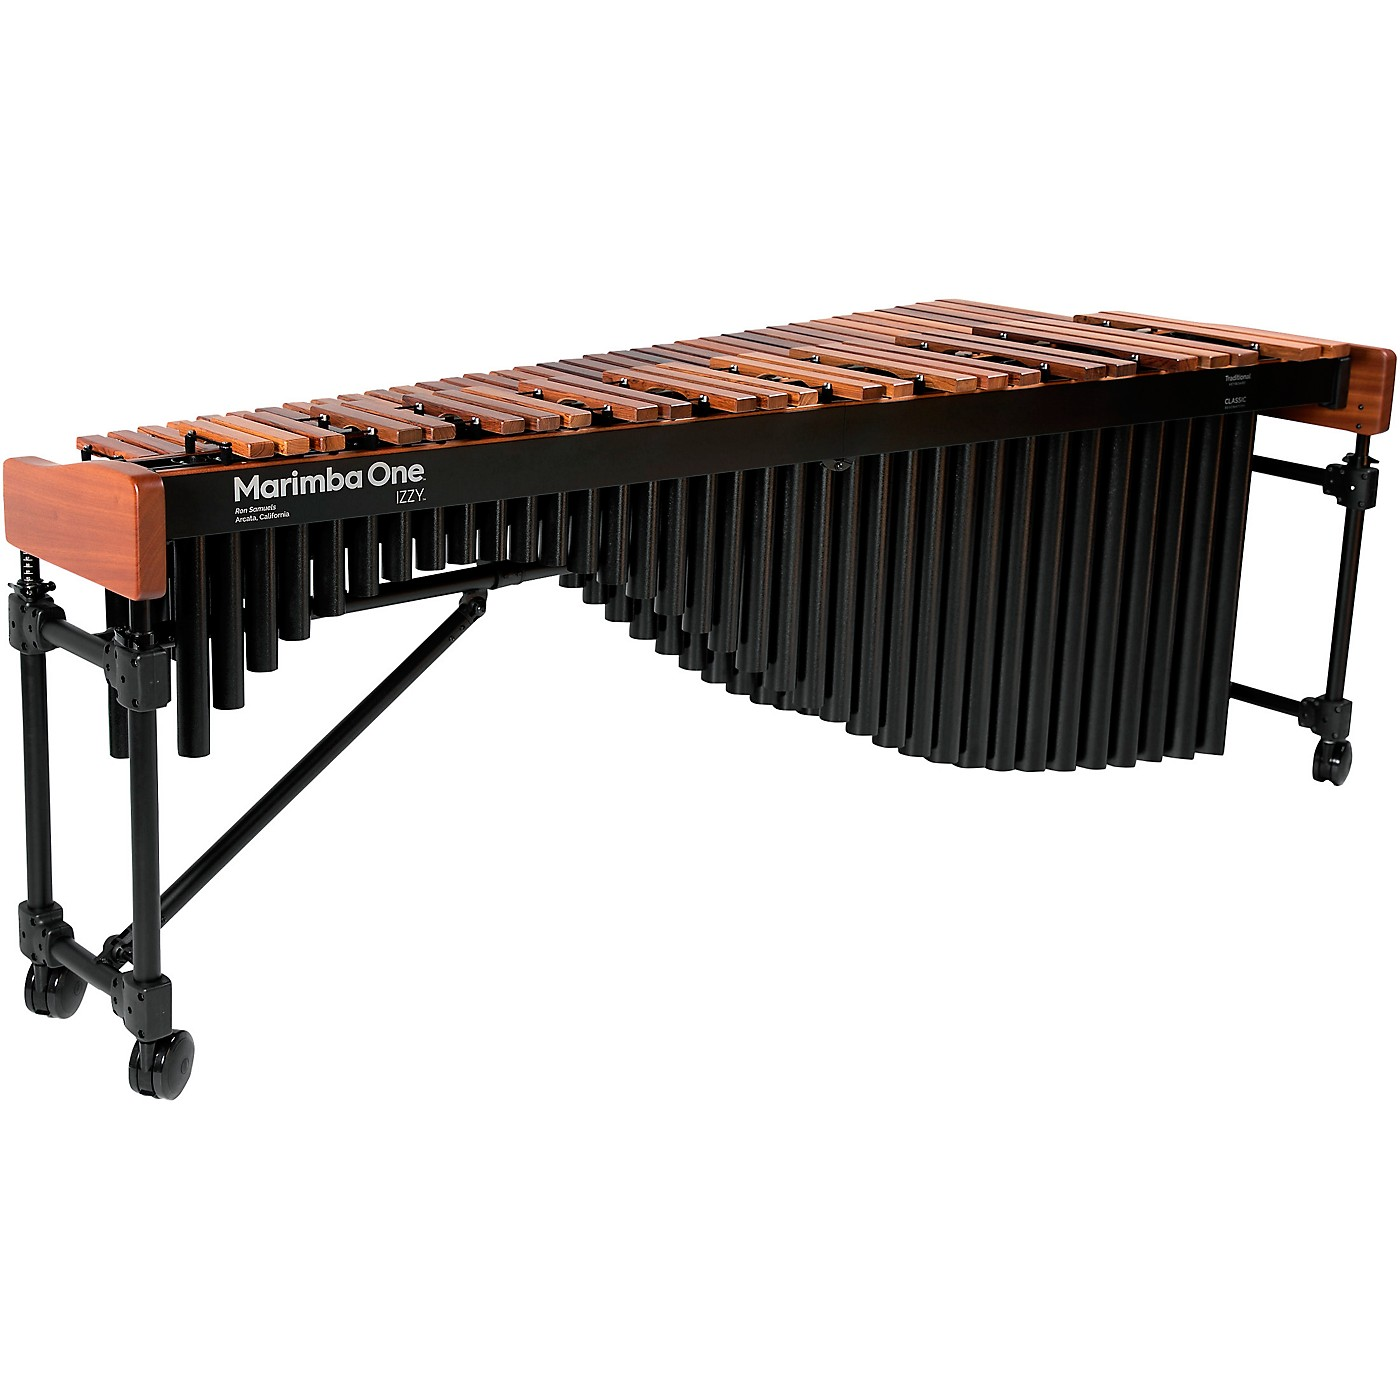 Marimba One Izzy #9504 A442 Marimba with Traditional Keyboard and Basso Bravo Resonators thumbnail